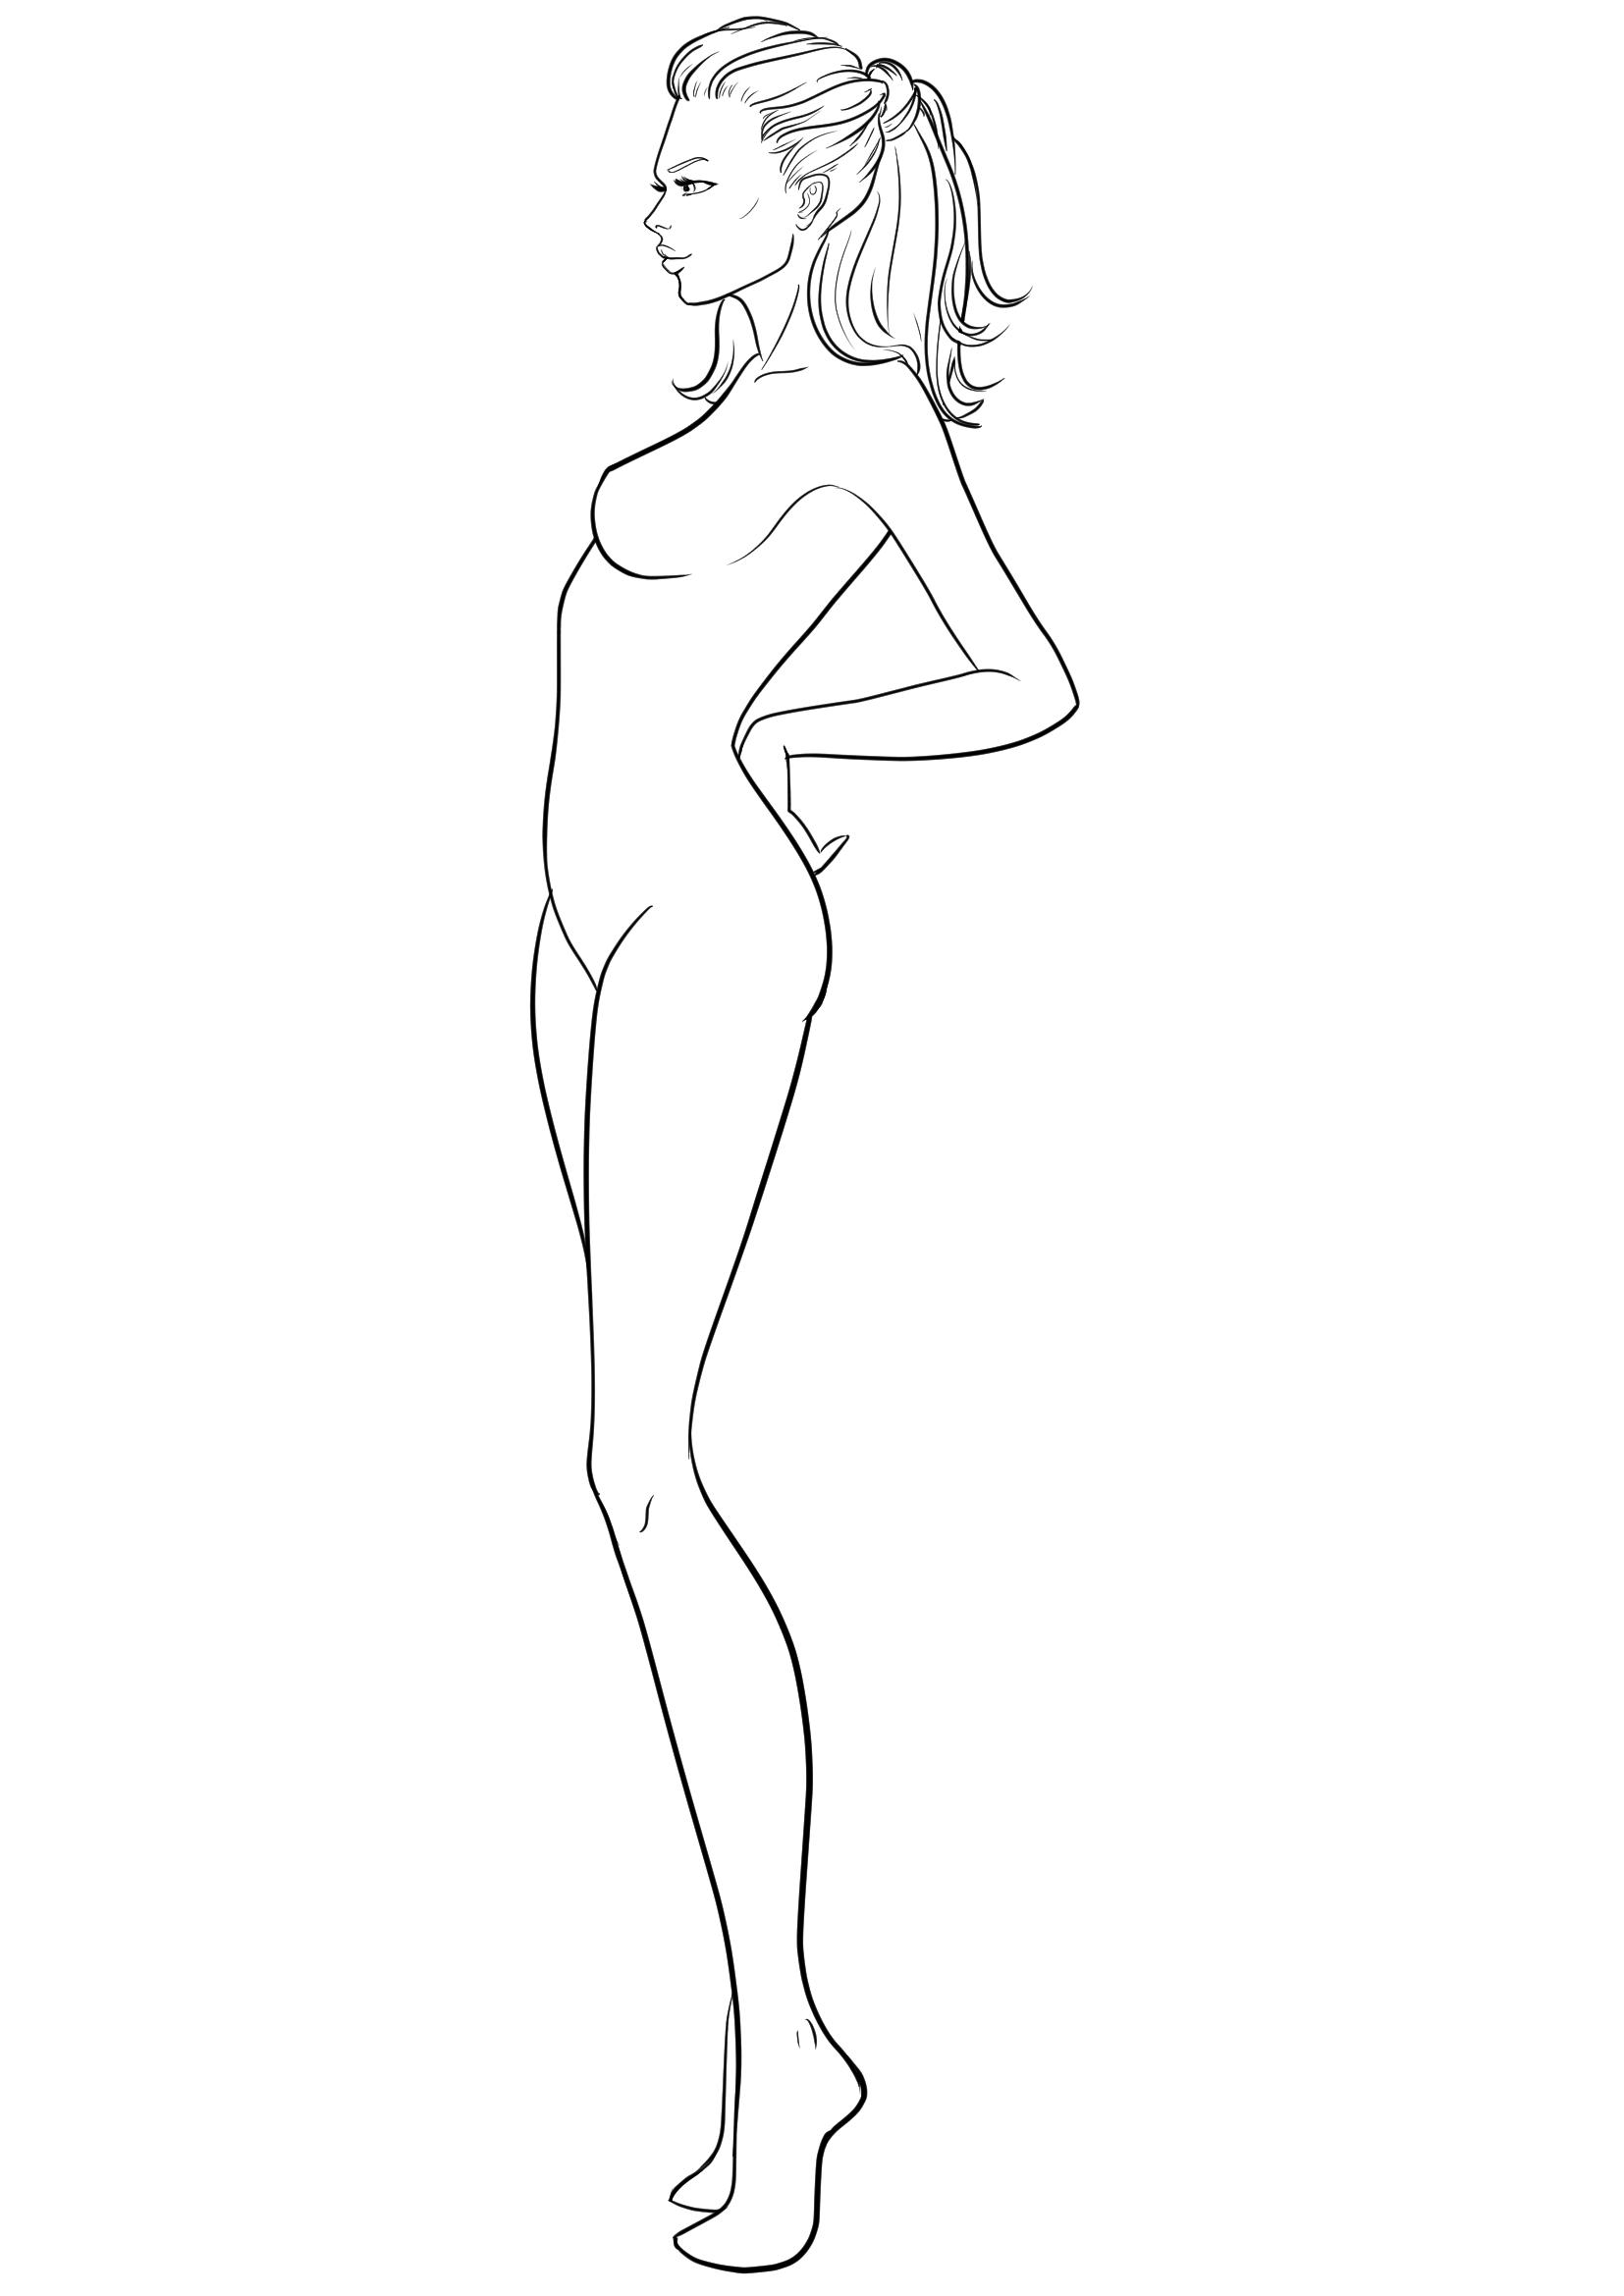 Tops fashion design sketches flat fashion sketch top 045 - Figure Template 38 I Draw Fashion Blank Body Template For Fashion Design Drawing